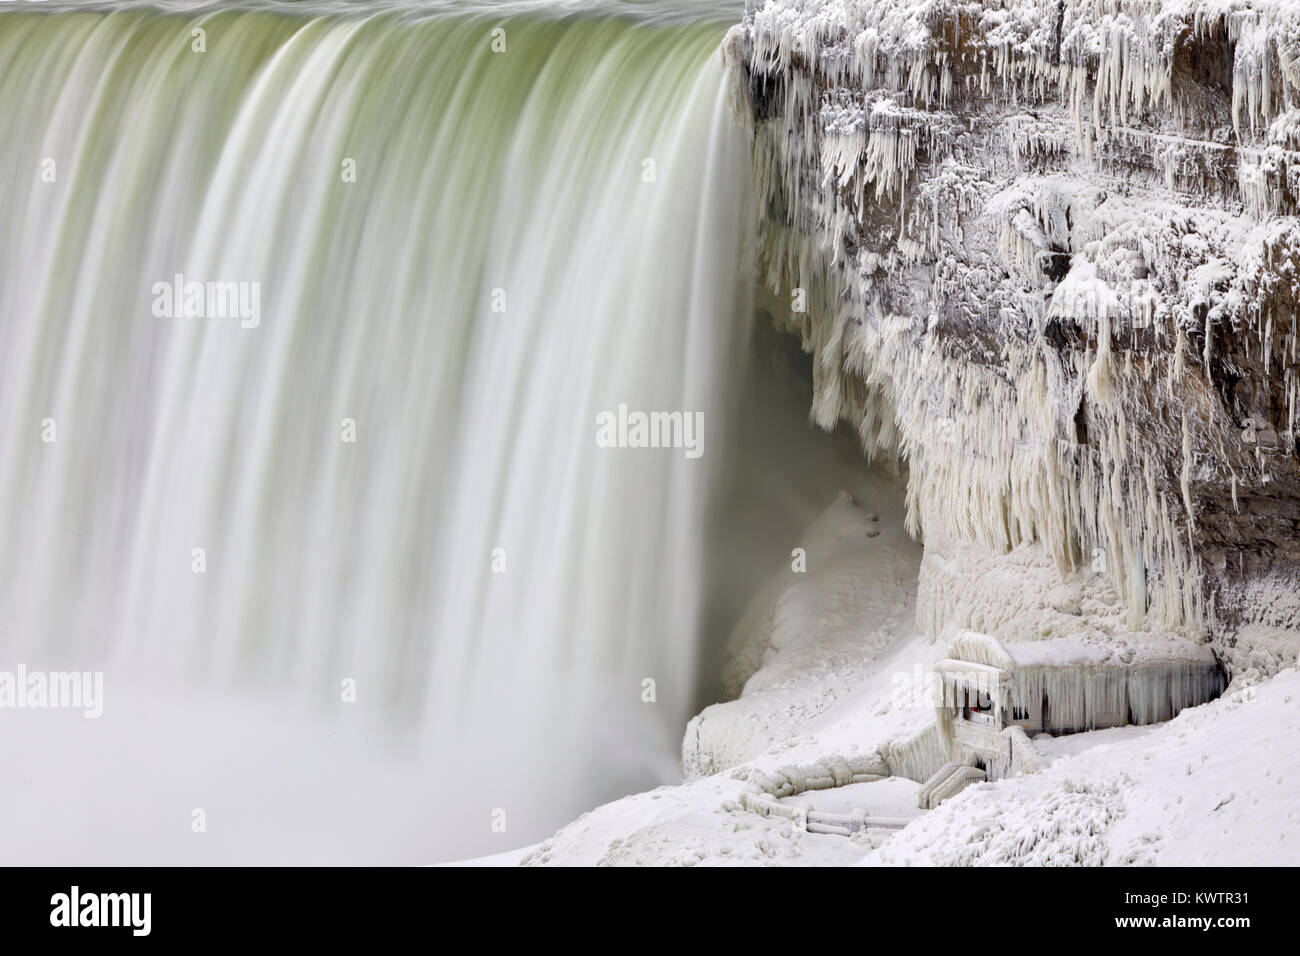 Niagara Falls - Ice Studies Jan 2018 Stock Photo